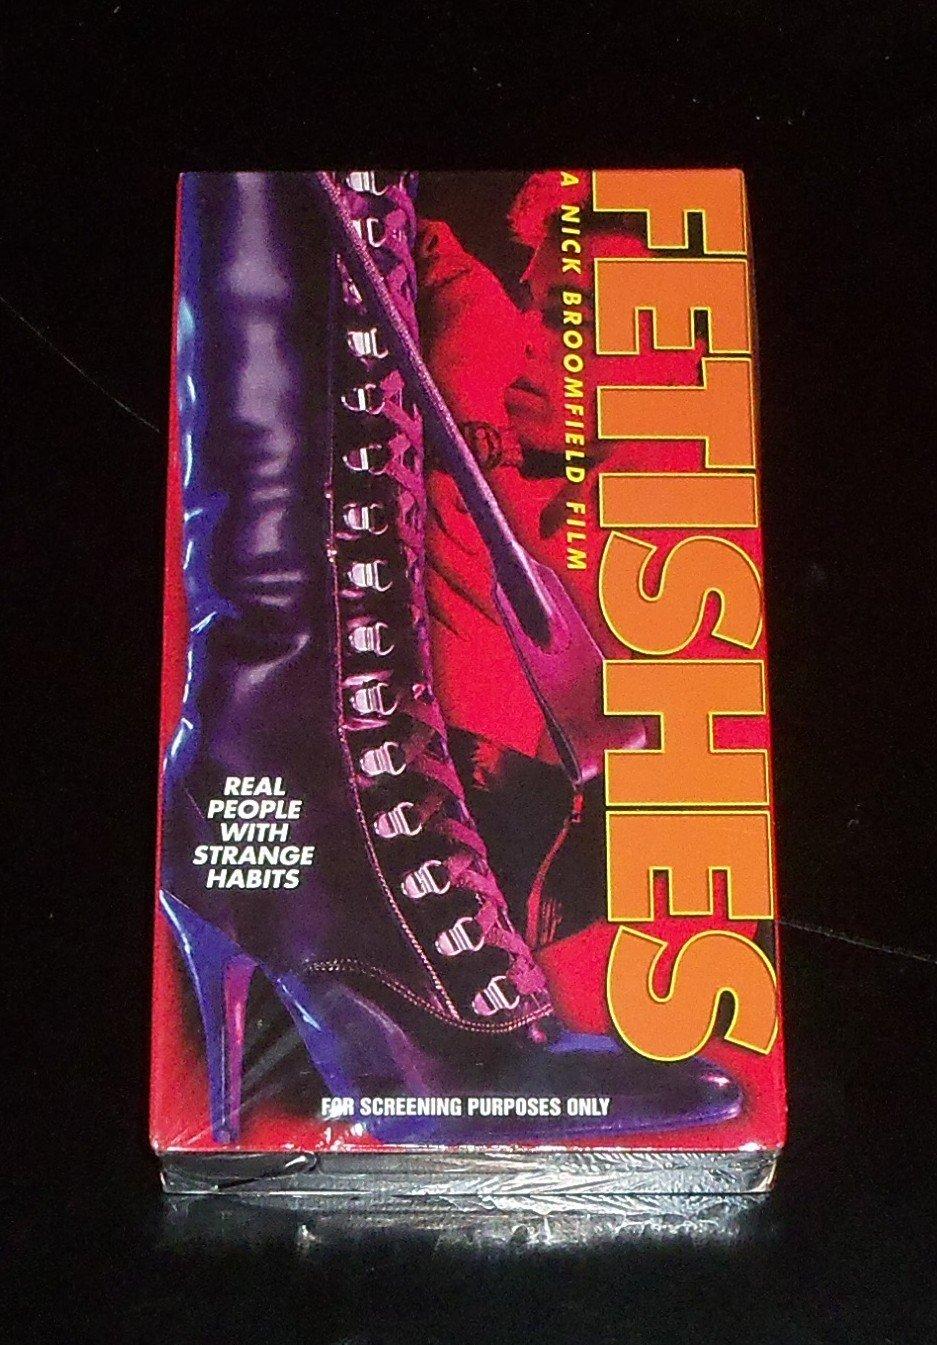 Amazon.com: Fetishes [VHS]: Mistress Beatrice, Nick Broomfield, Mistress Catherine, Mistress Delilah, Mistress Natasha, Mistress Raven, Elissa Wald, ...